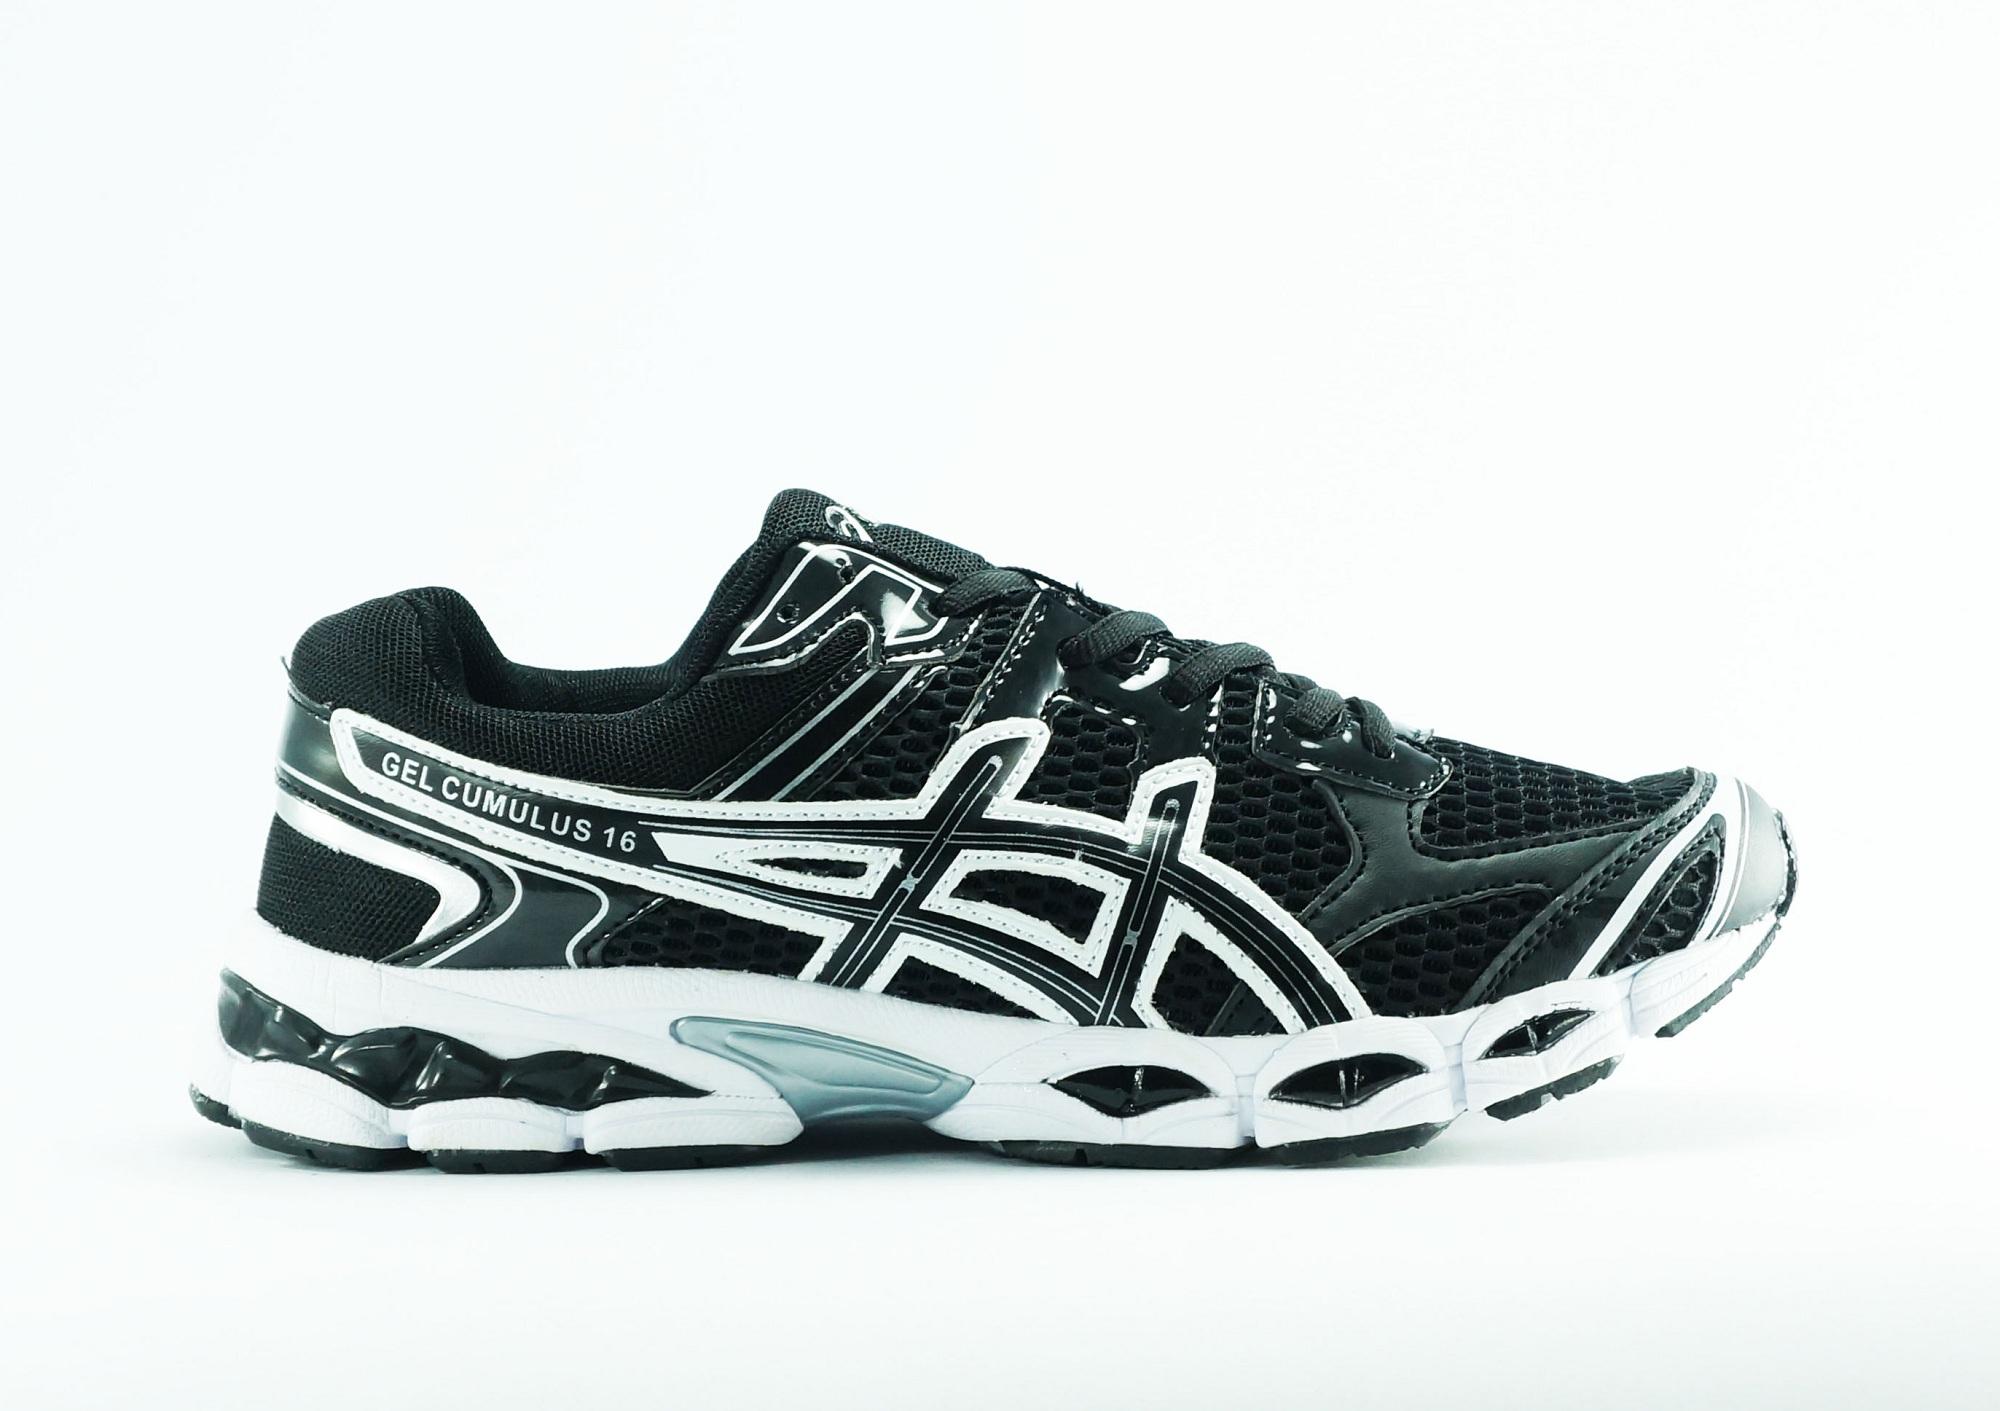 Jual Sepatu running sport Premium casual lari Asics Gel Cumulus 16 ... e7a2138464